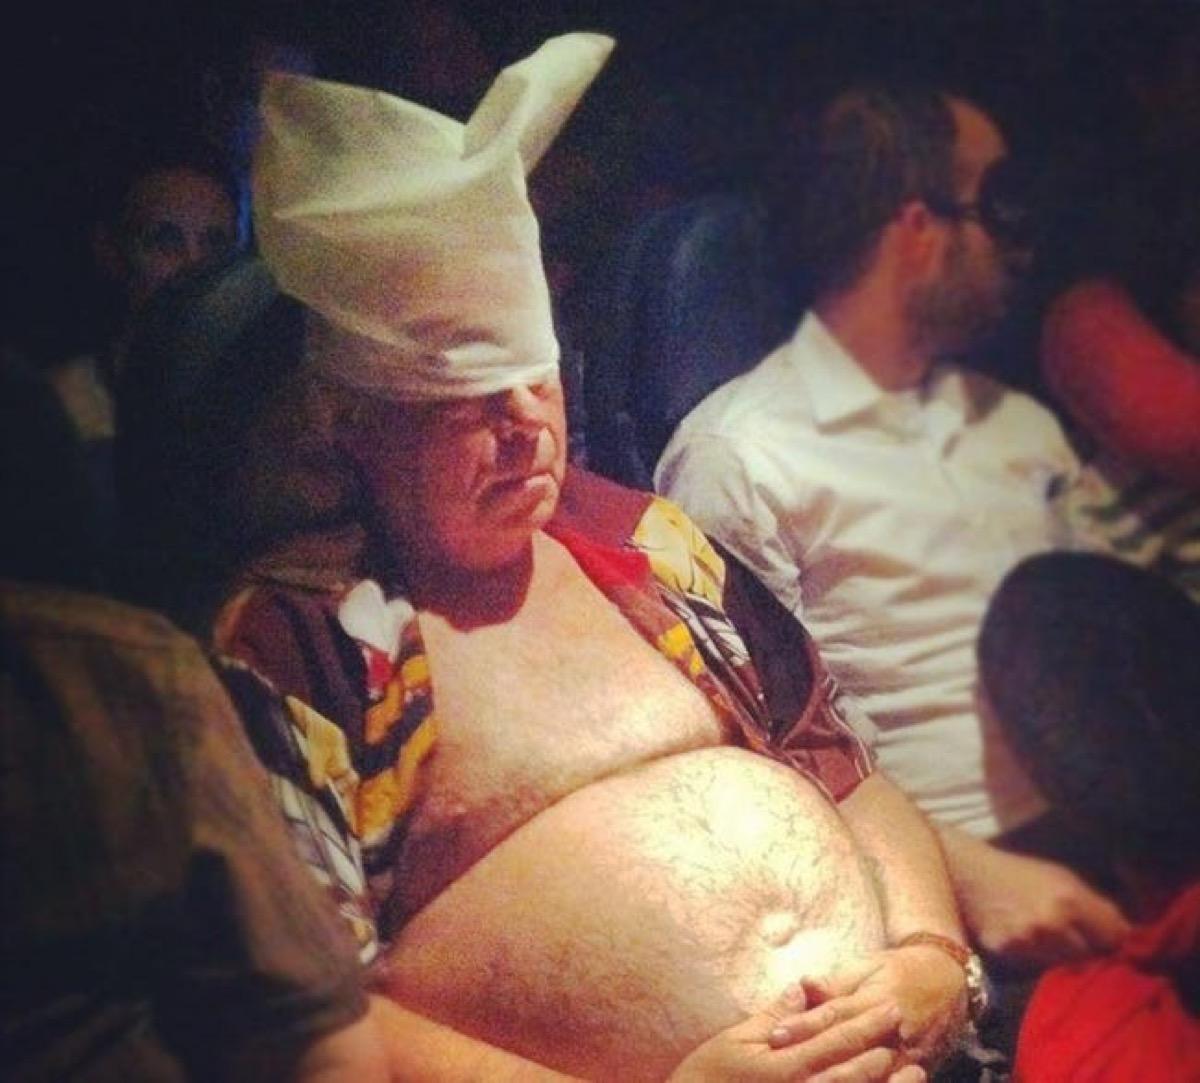 shirtless man on airplane photos of terrible airplane passengers